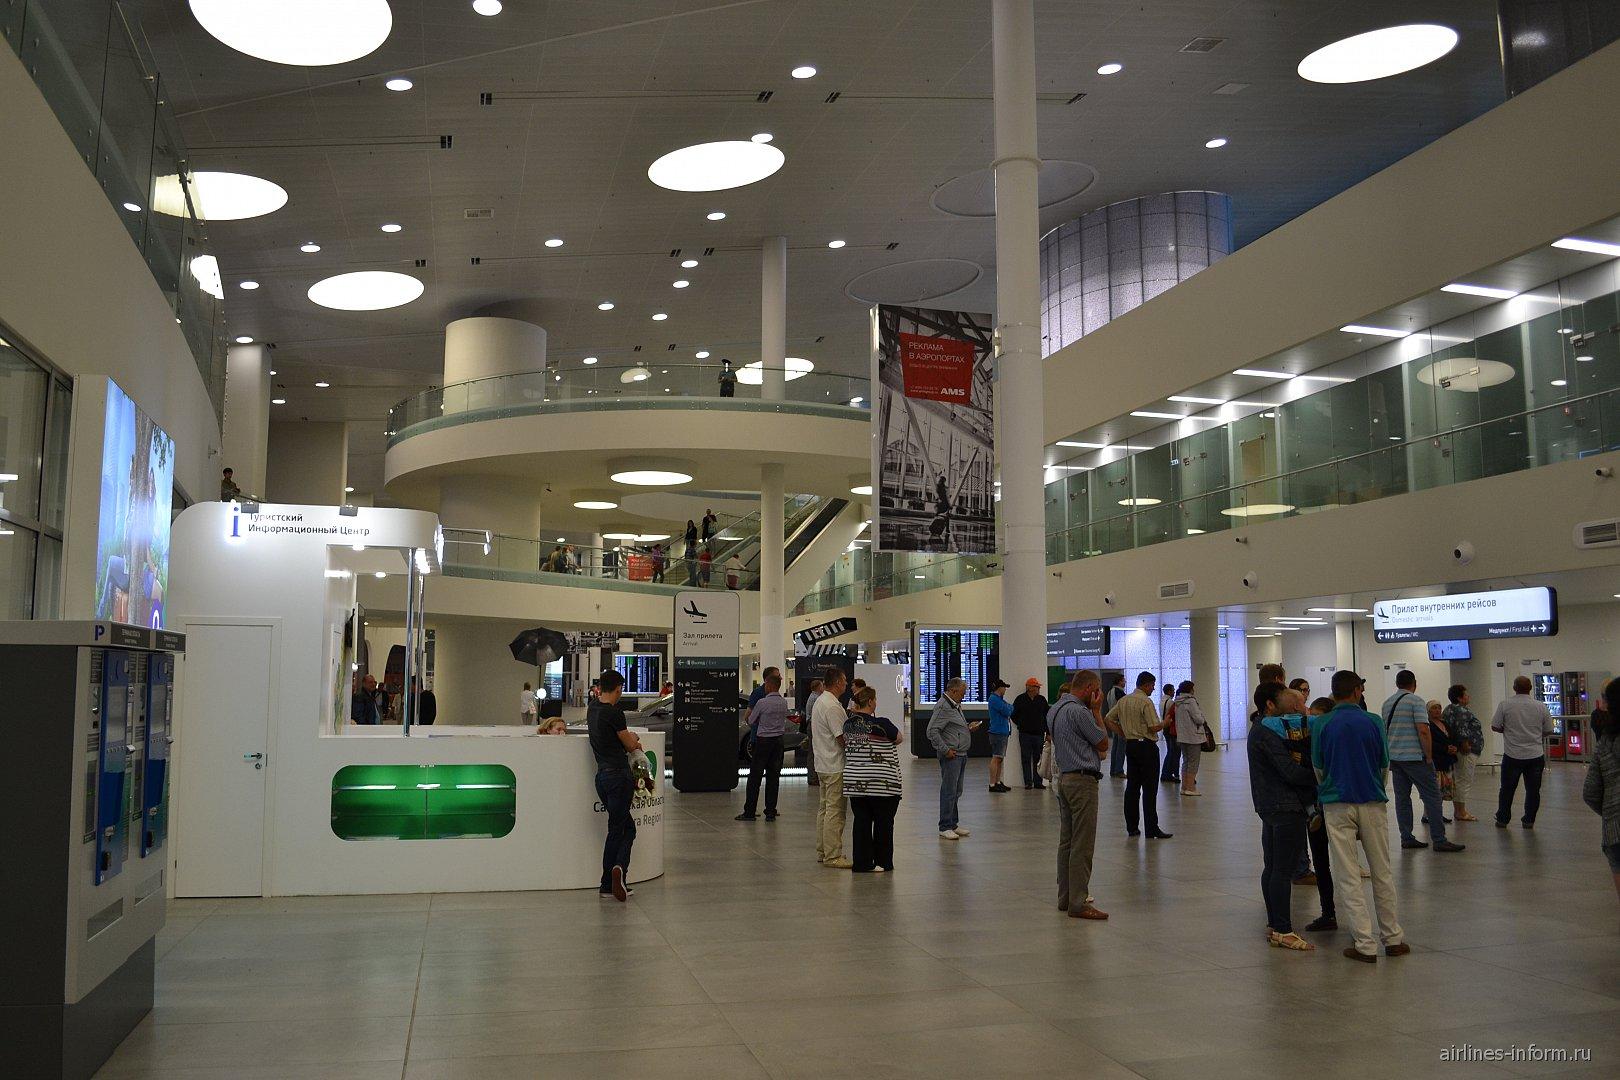 Зал для встречающих в аэровокзале аэропорта Самара Курумоч